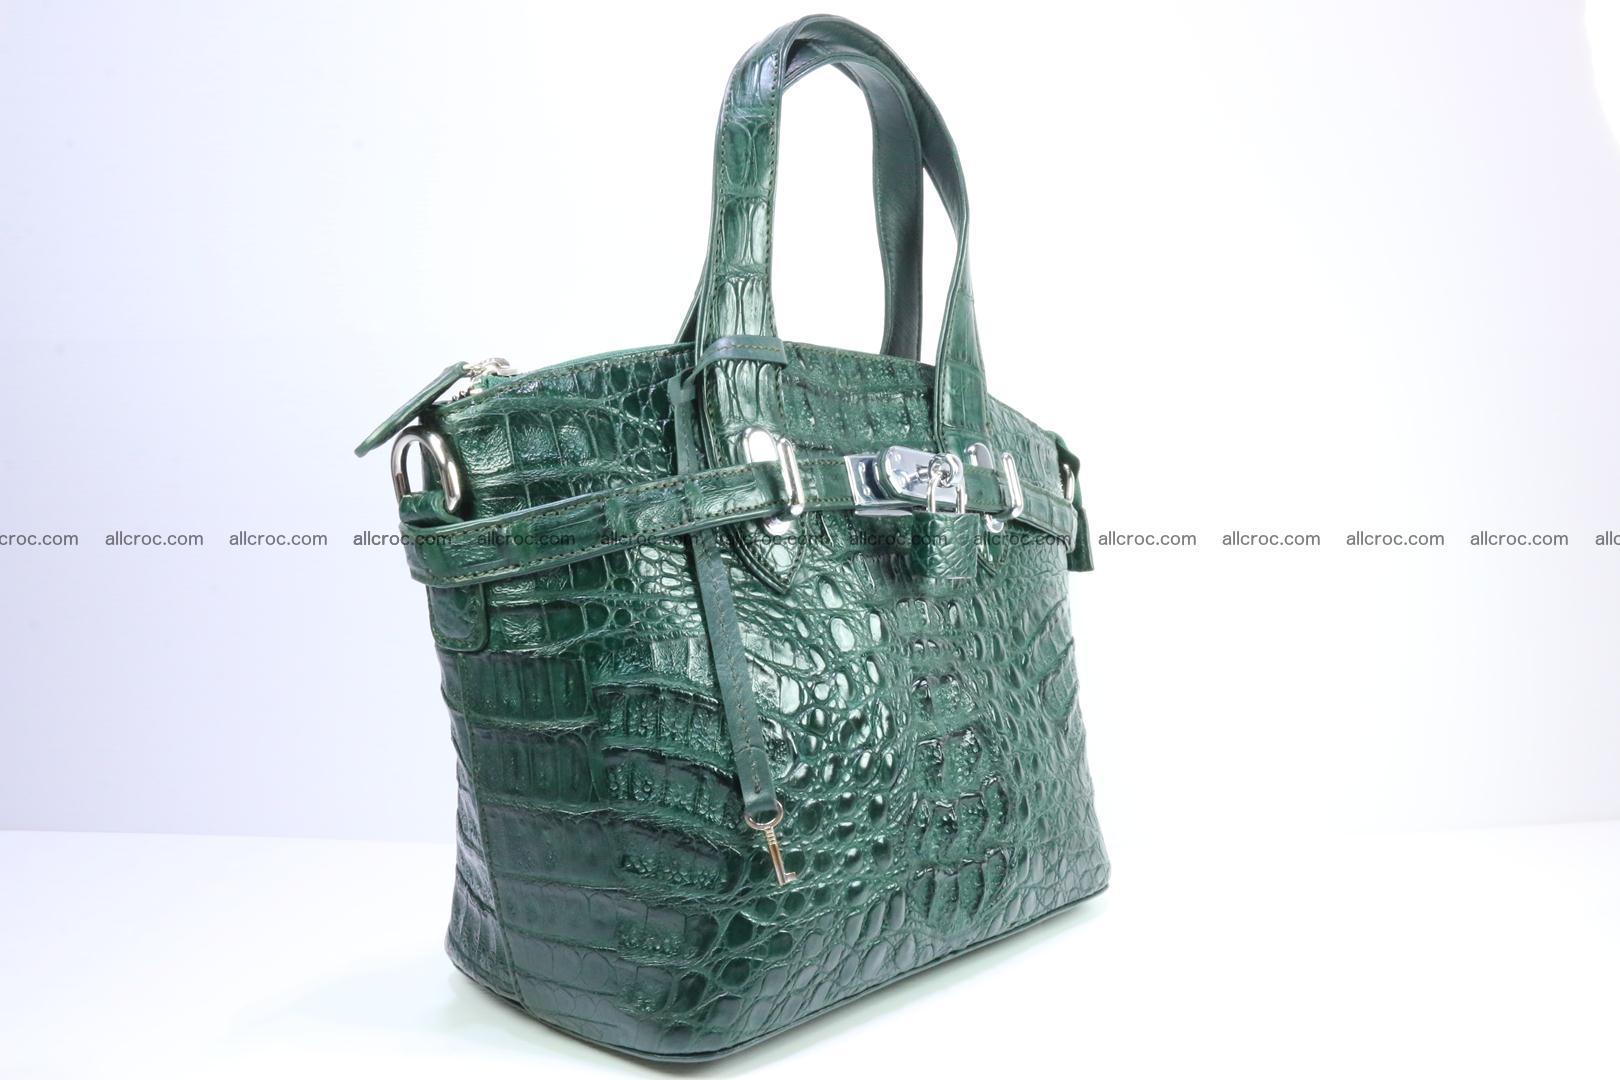 Genuine crocodile handbag for ladies 047 Foto 1